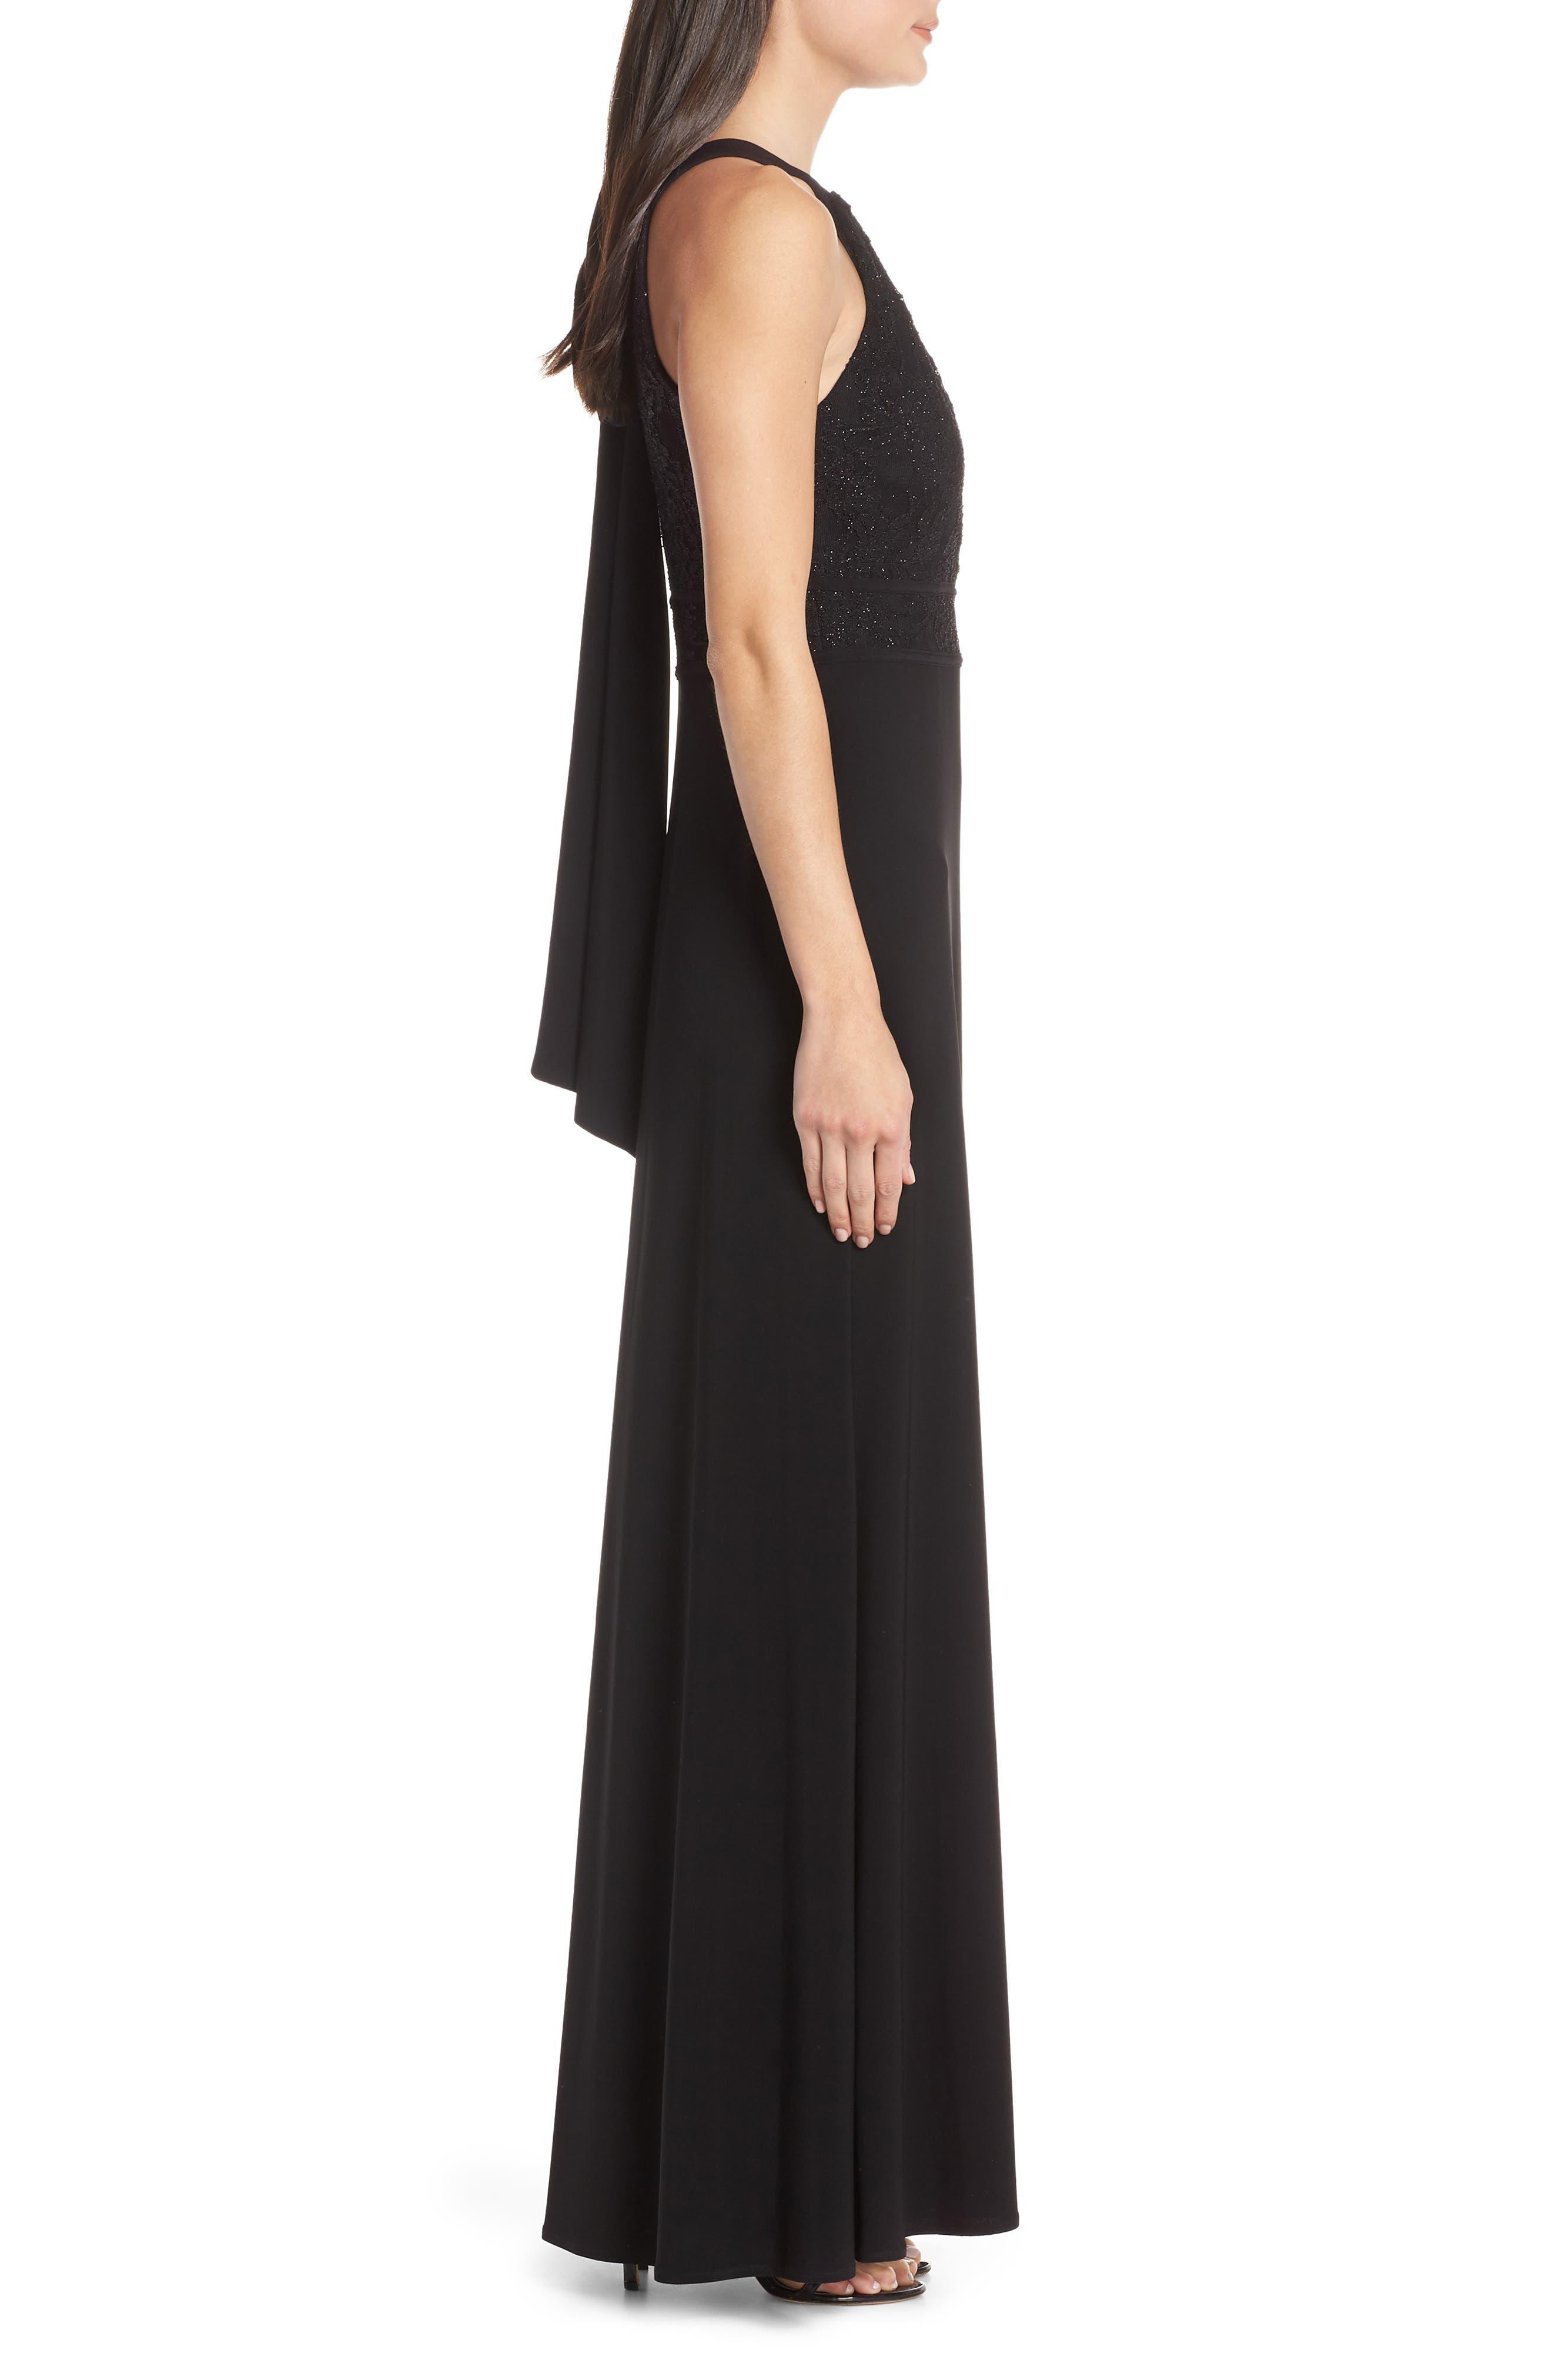 MORGAN & CO.,                             Pleat Lace Bodice Evening Dress,                             Alternate thumbnail 3, color,                             BLACK